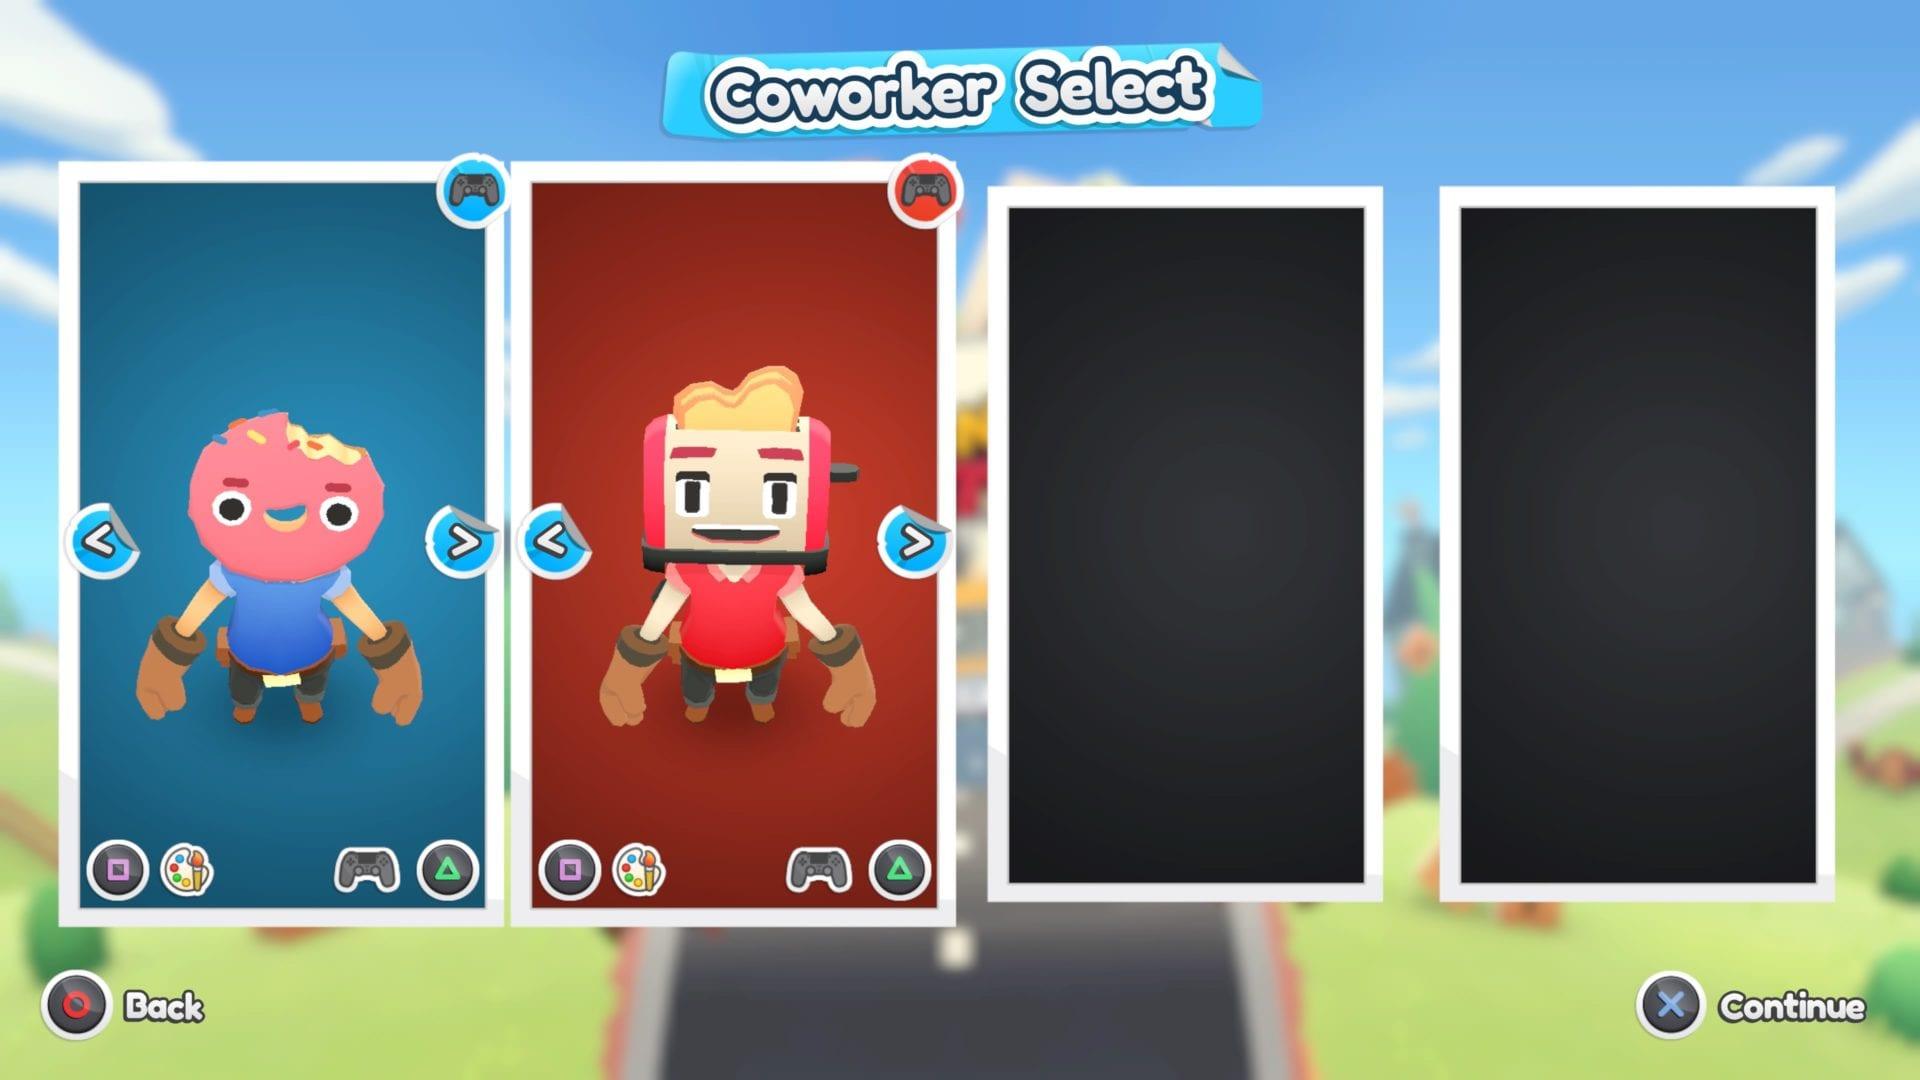 salir, multijugador cooperativo